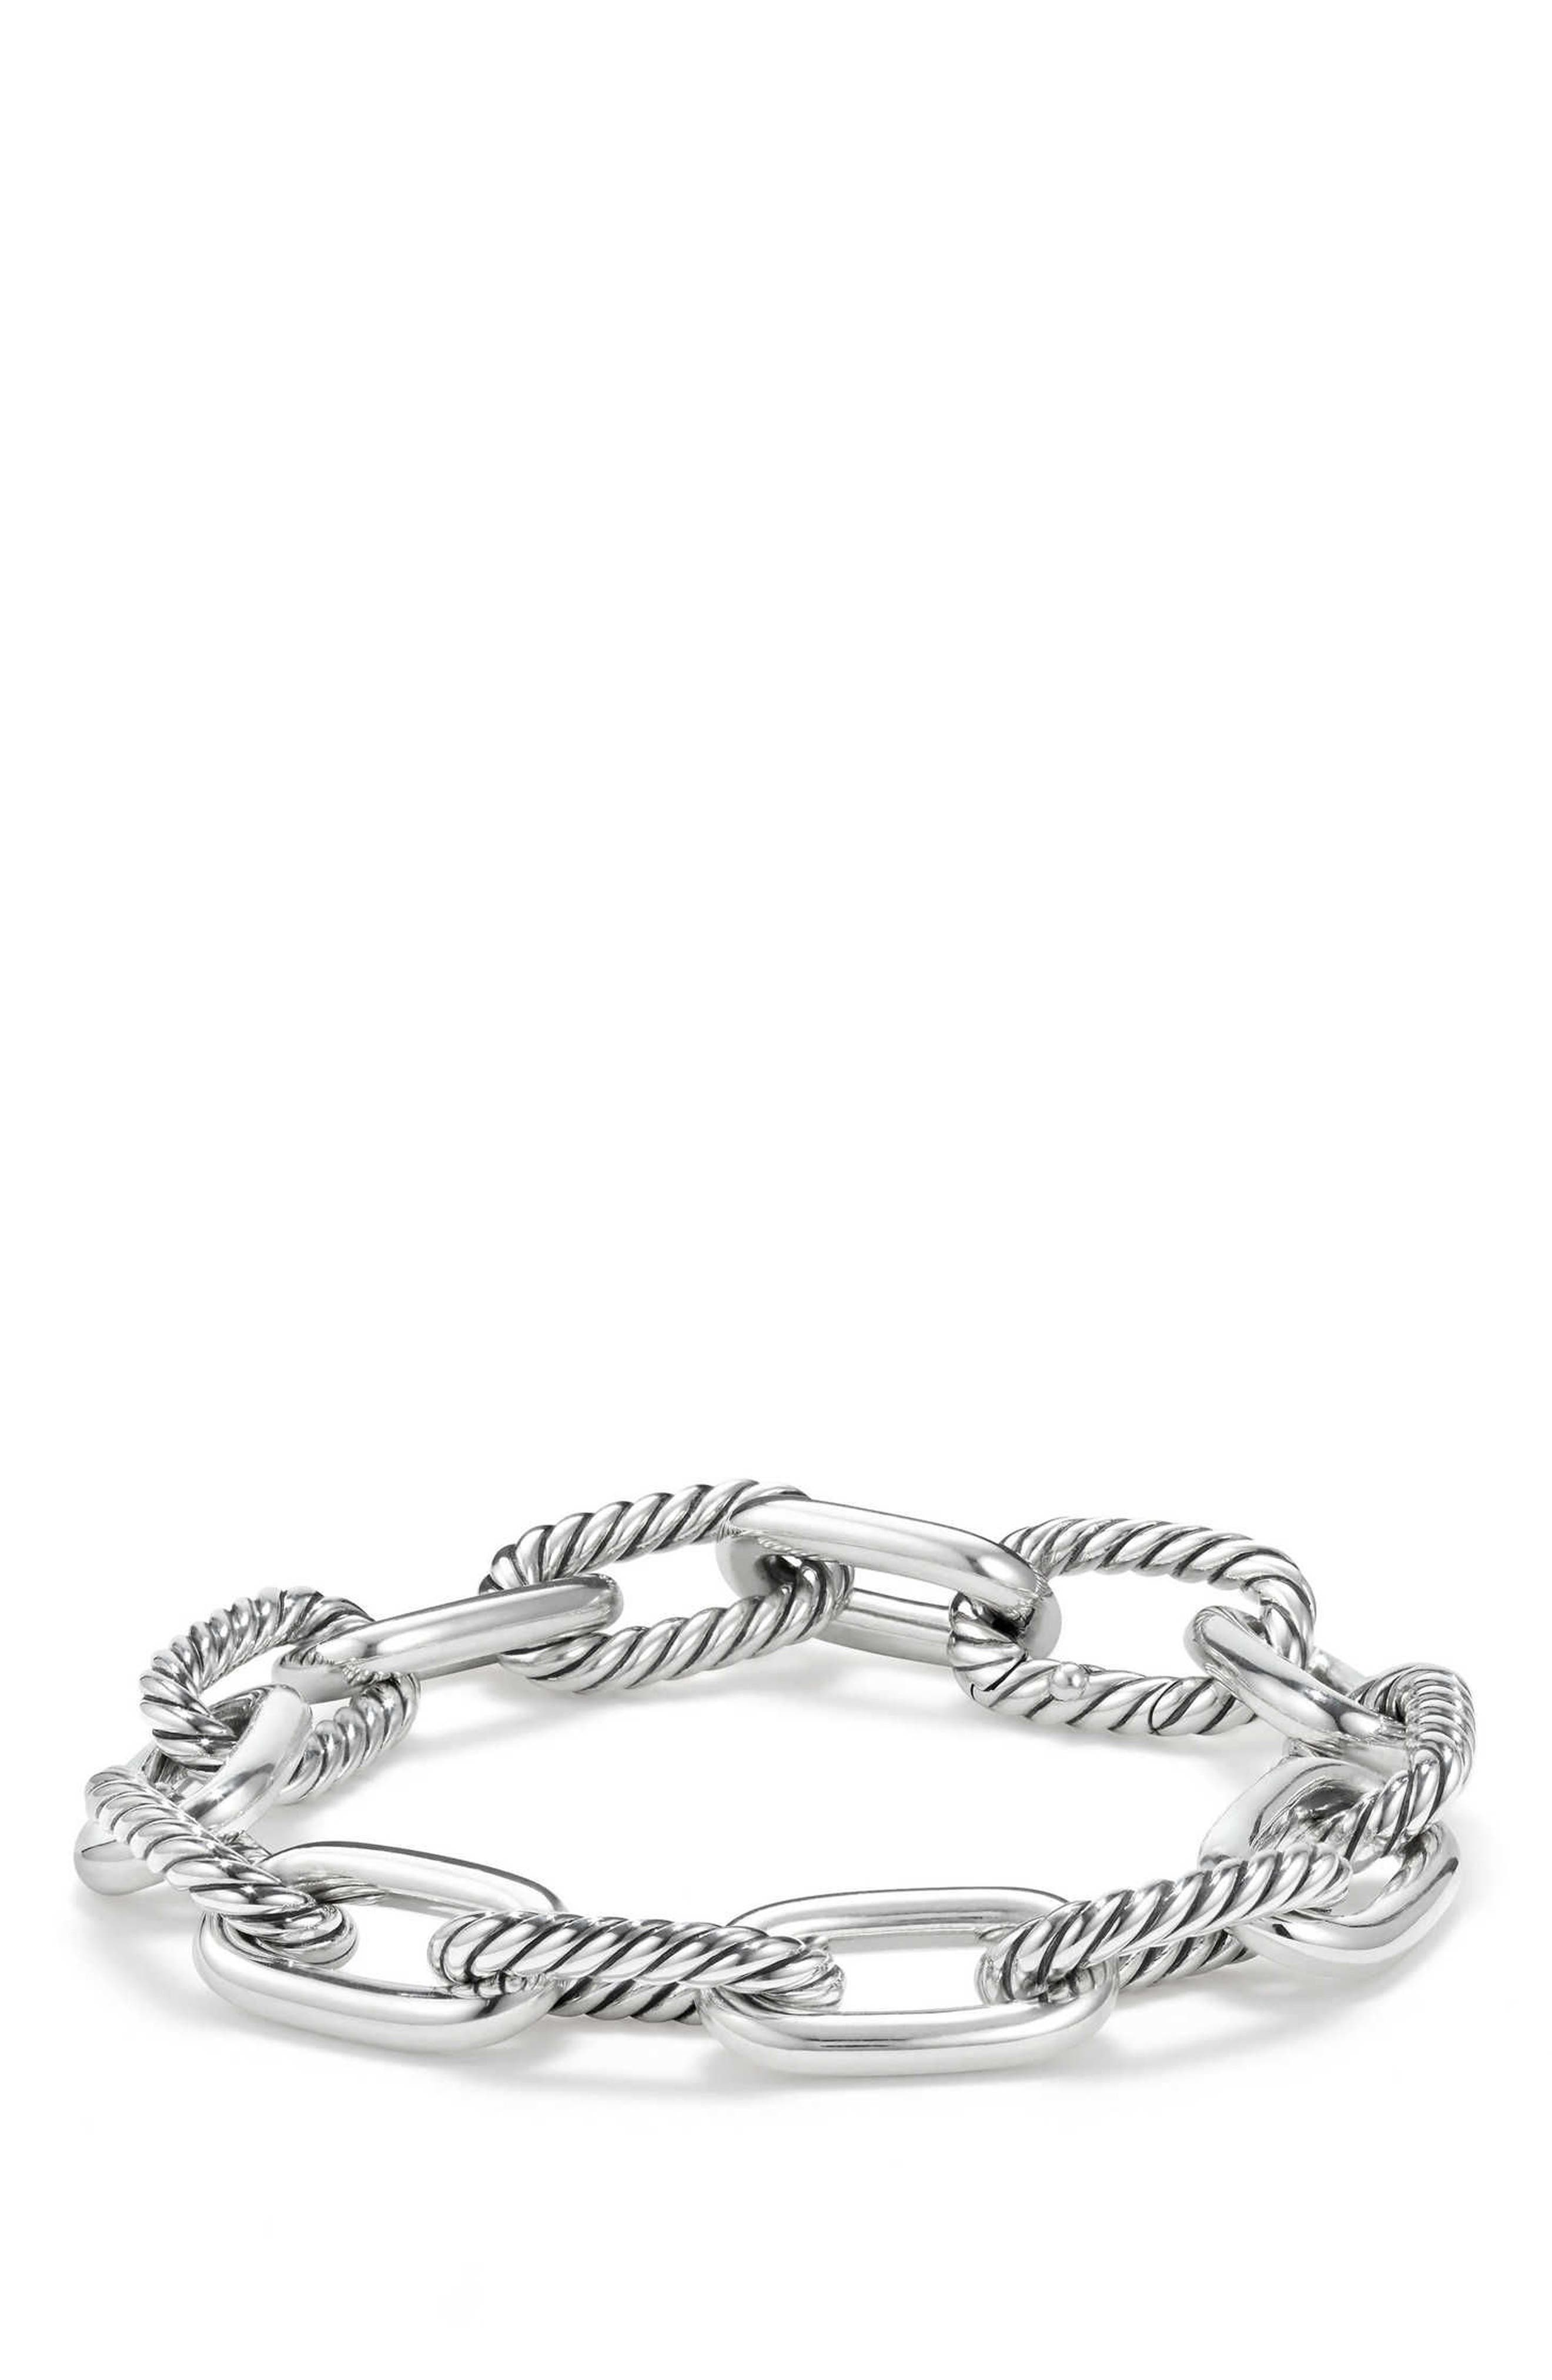 Main Image - David Yurman DY Madison Chain Medium Bracelet